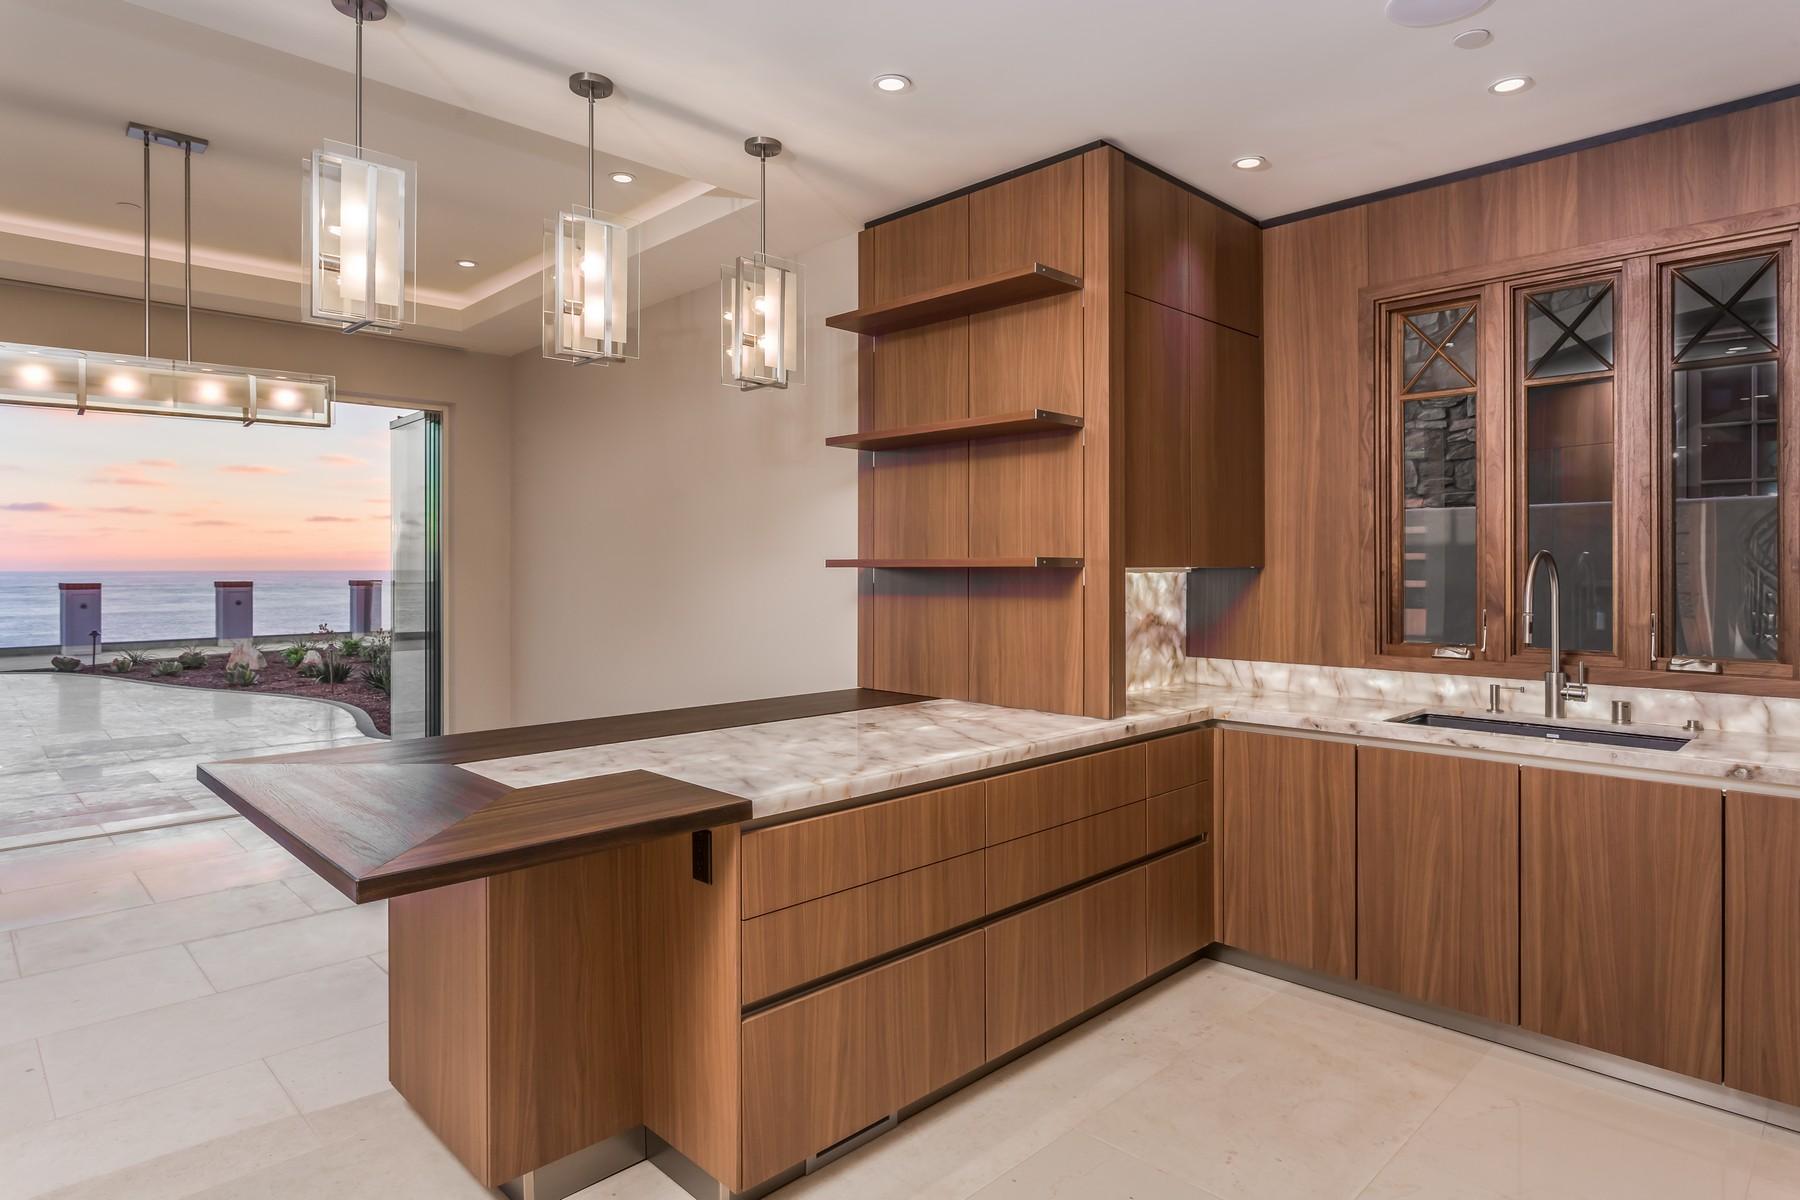 Additional photo for property listing at 824 Neptune Avenue  Encinitas, Калифорния 92024 Соединенные Штаты